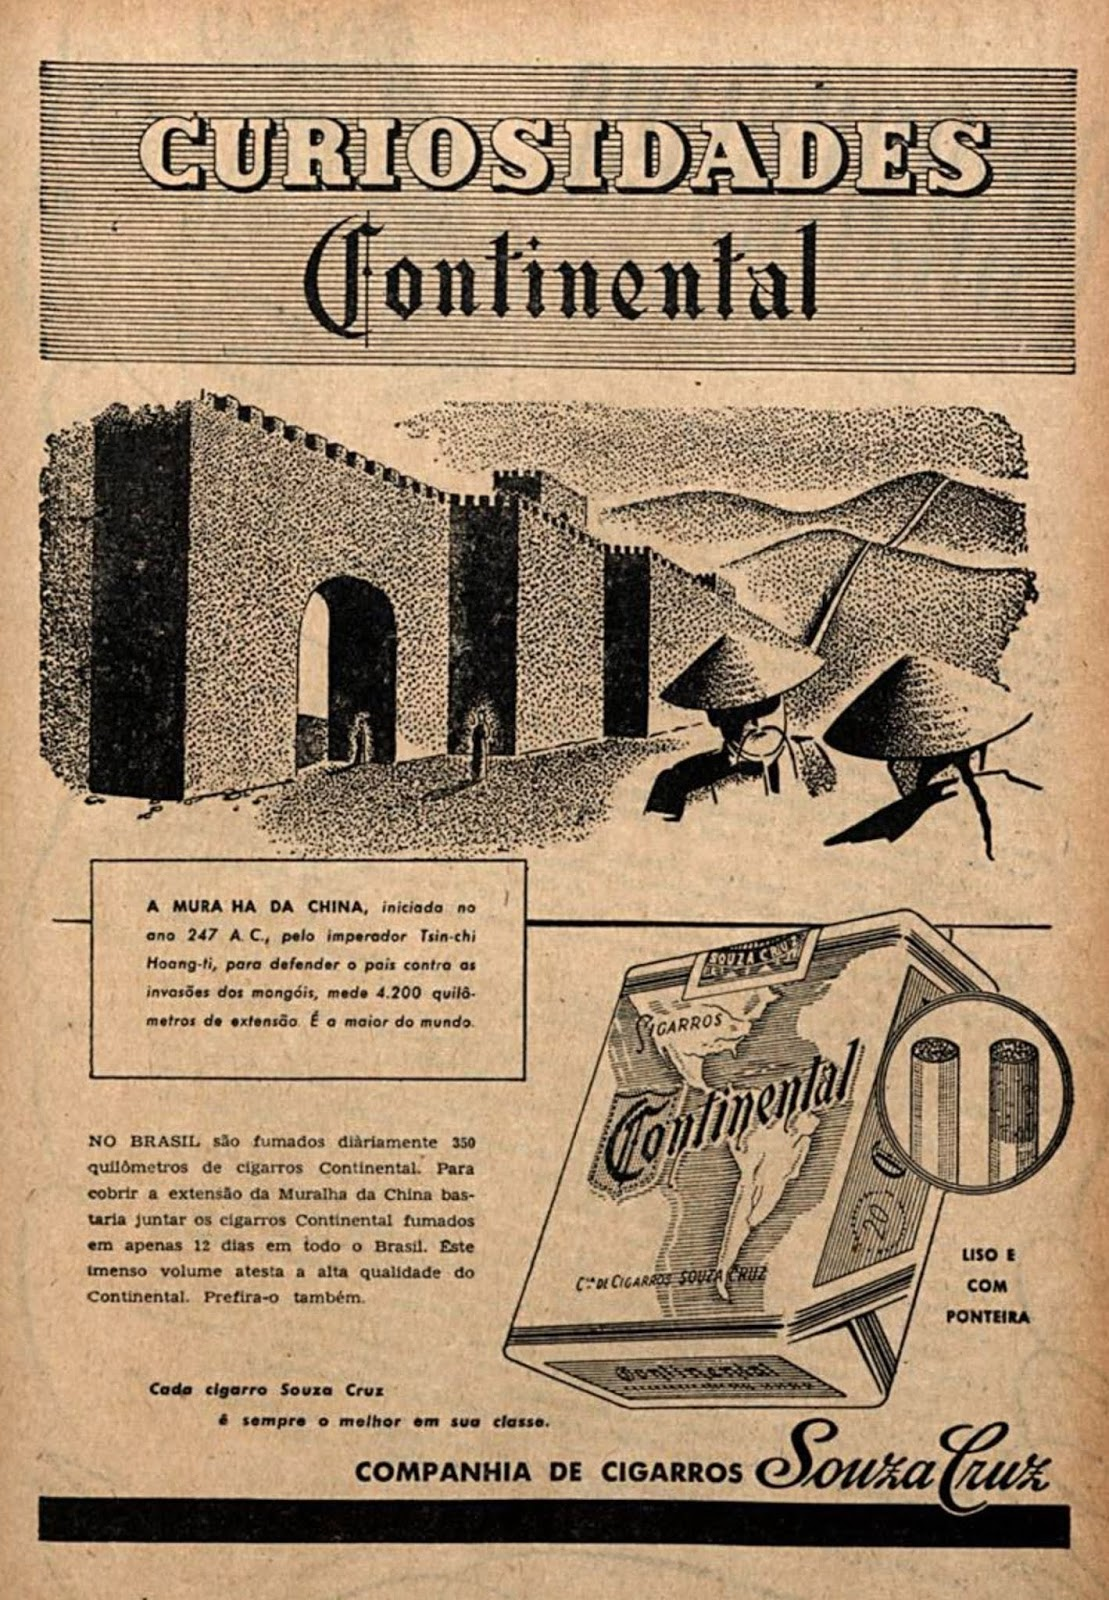 Propaganda de 1948 dos Cigarros Continental falando sobre a Muralha da China